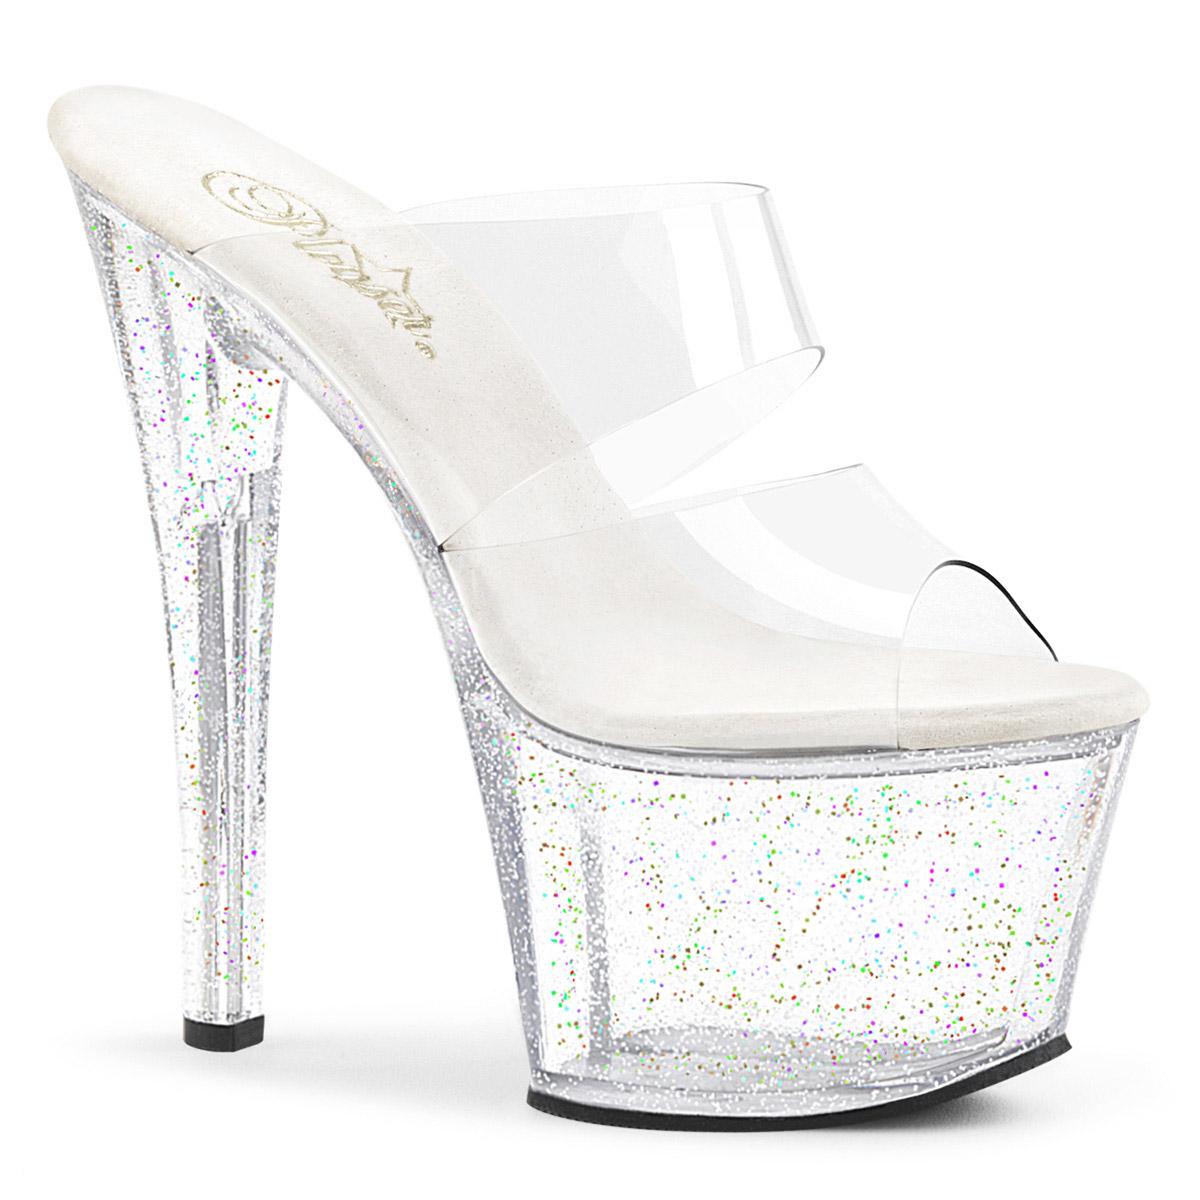 Dual Mini Band Mini Dual Iridescent Glitter Platform Slide Sandales Schuhes Adult Damens Clear 8ff2a6